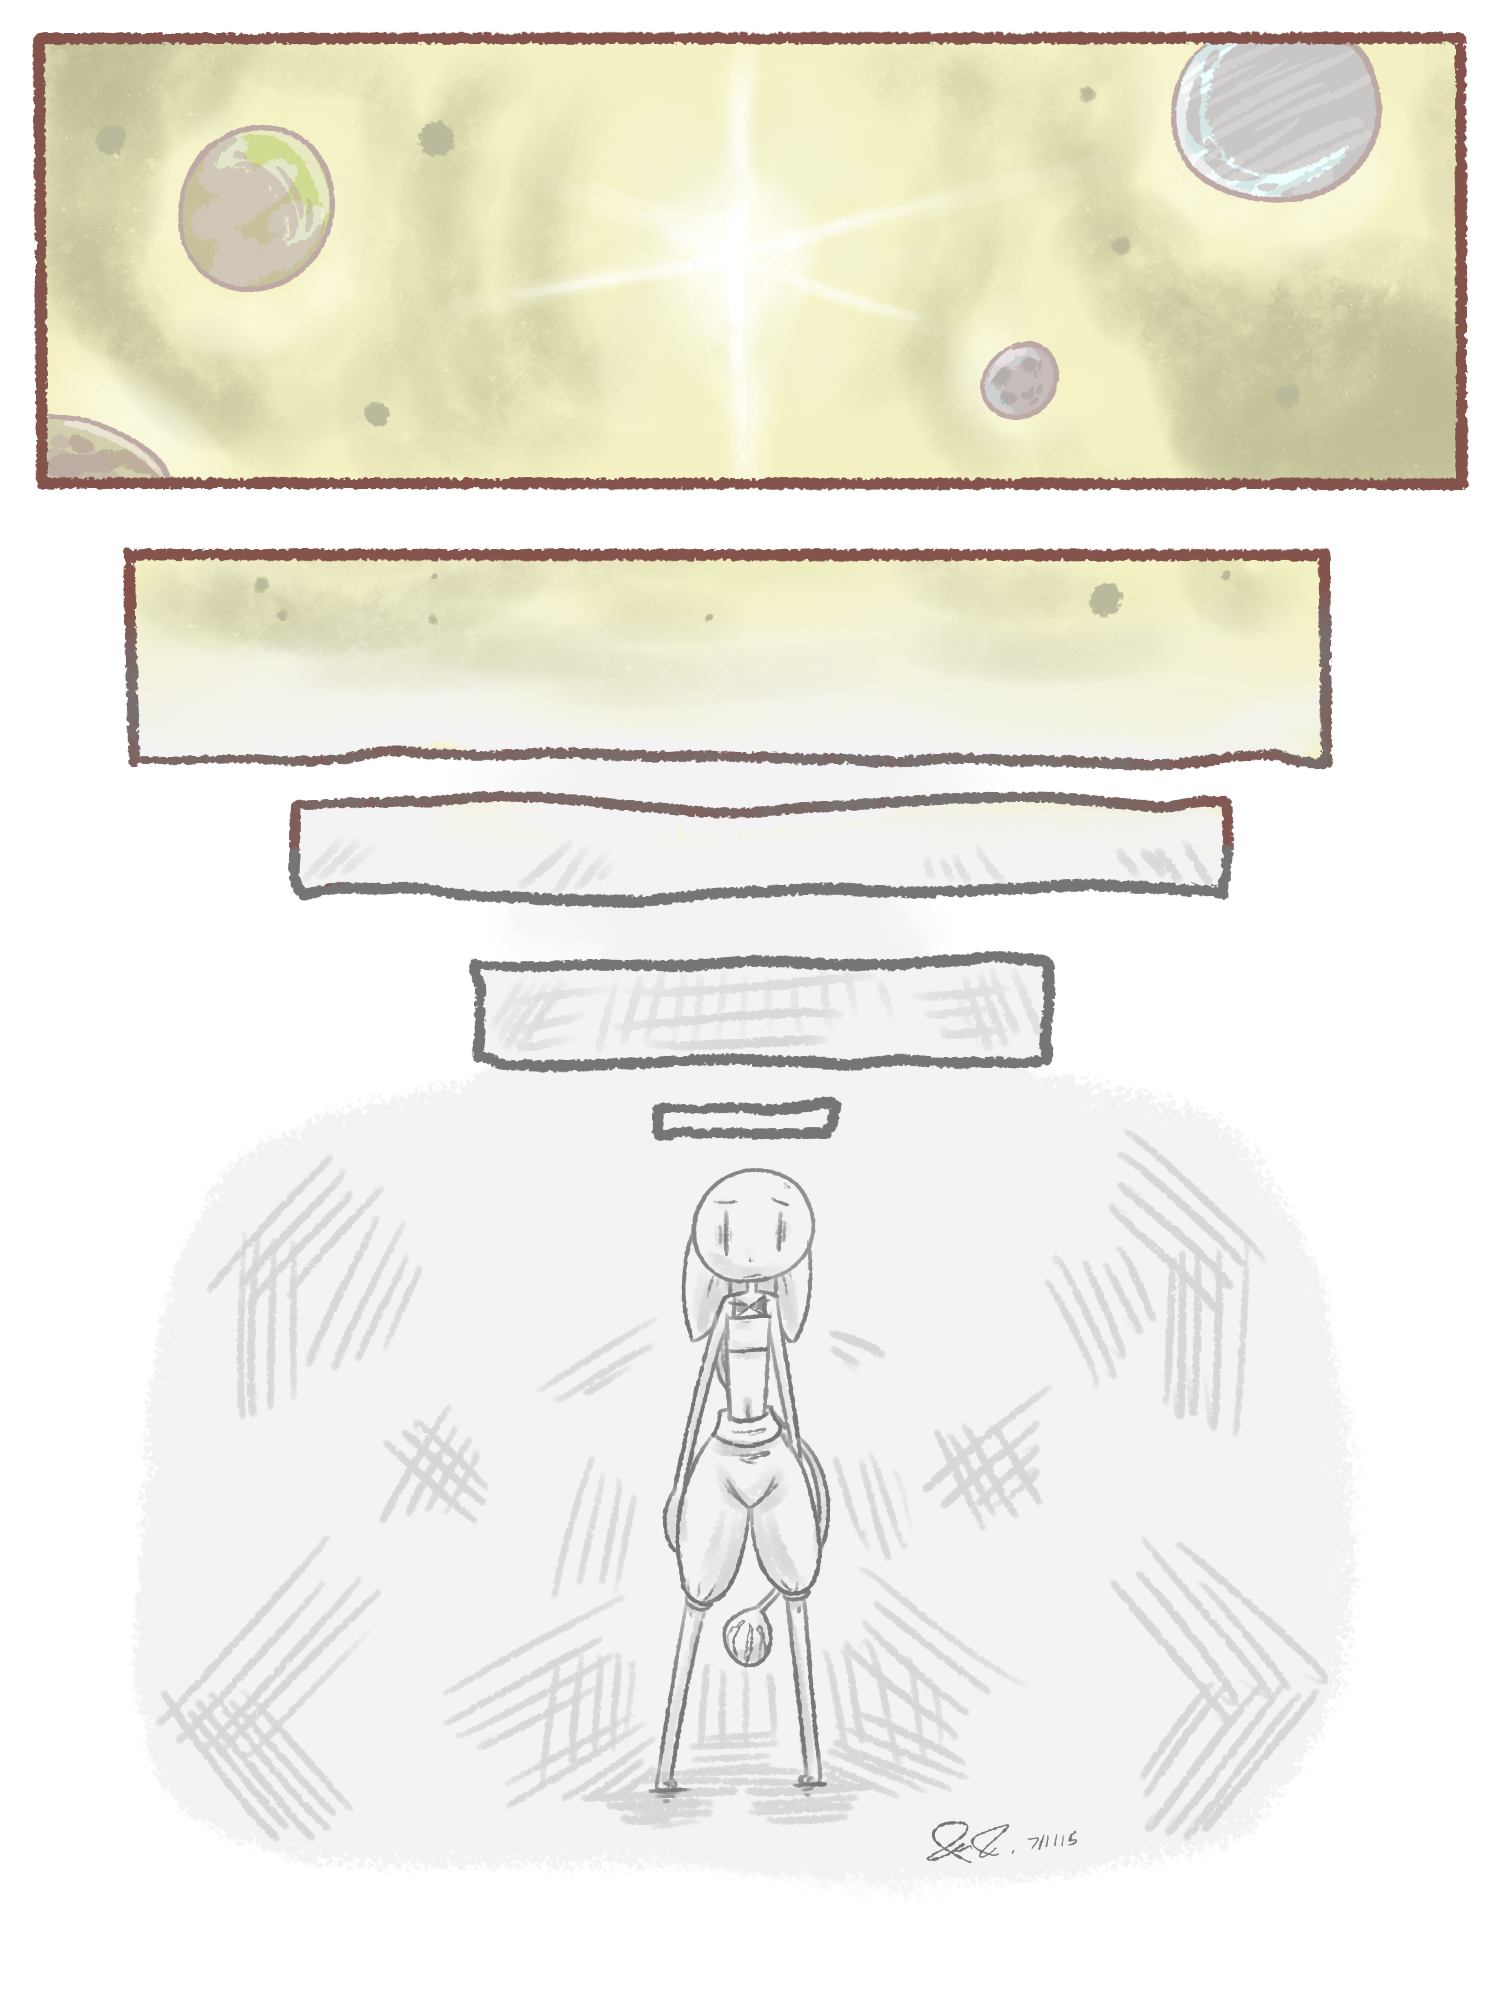 II-36-15